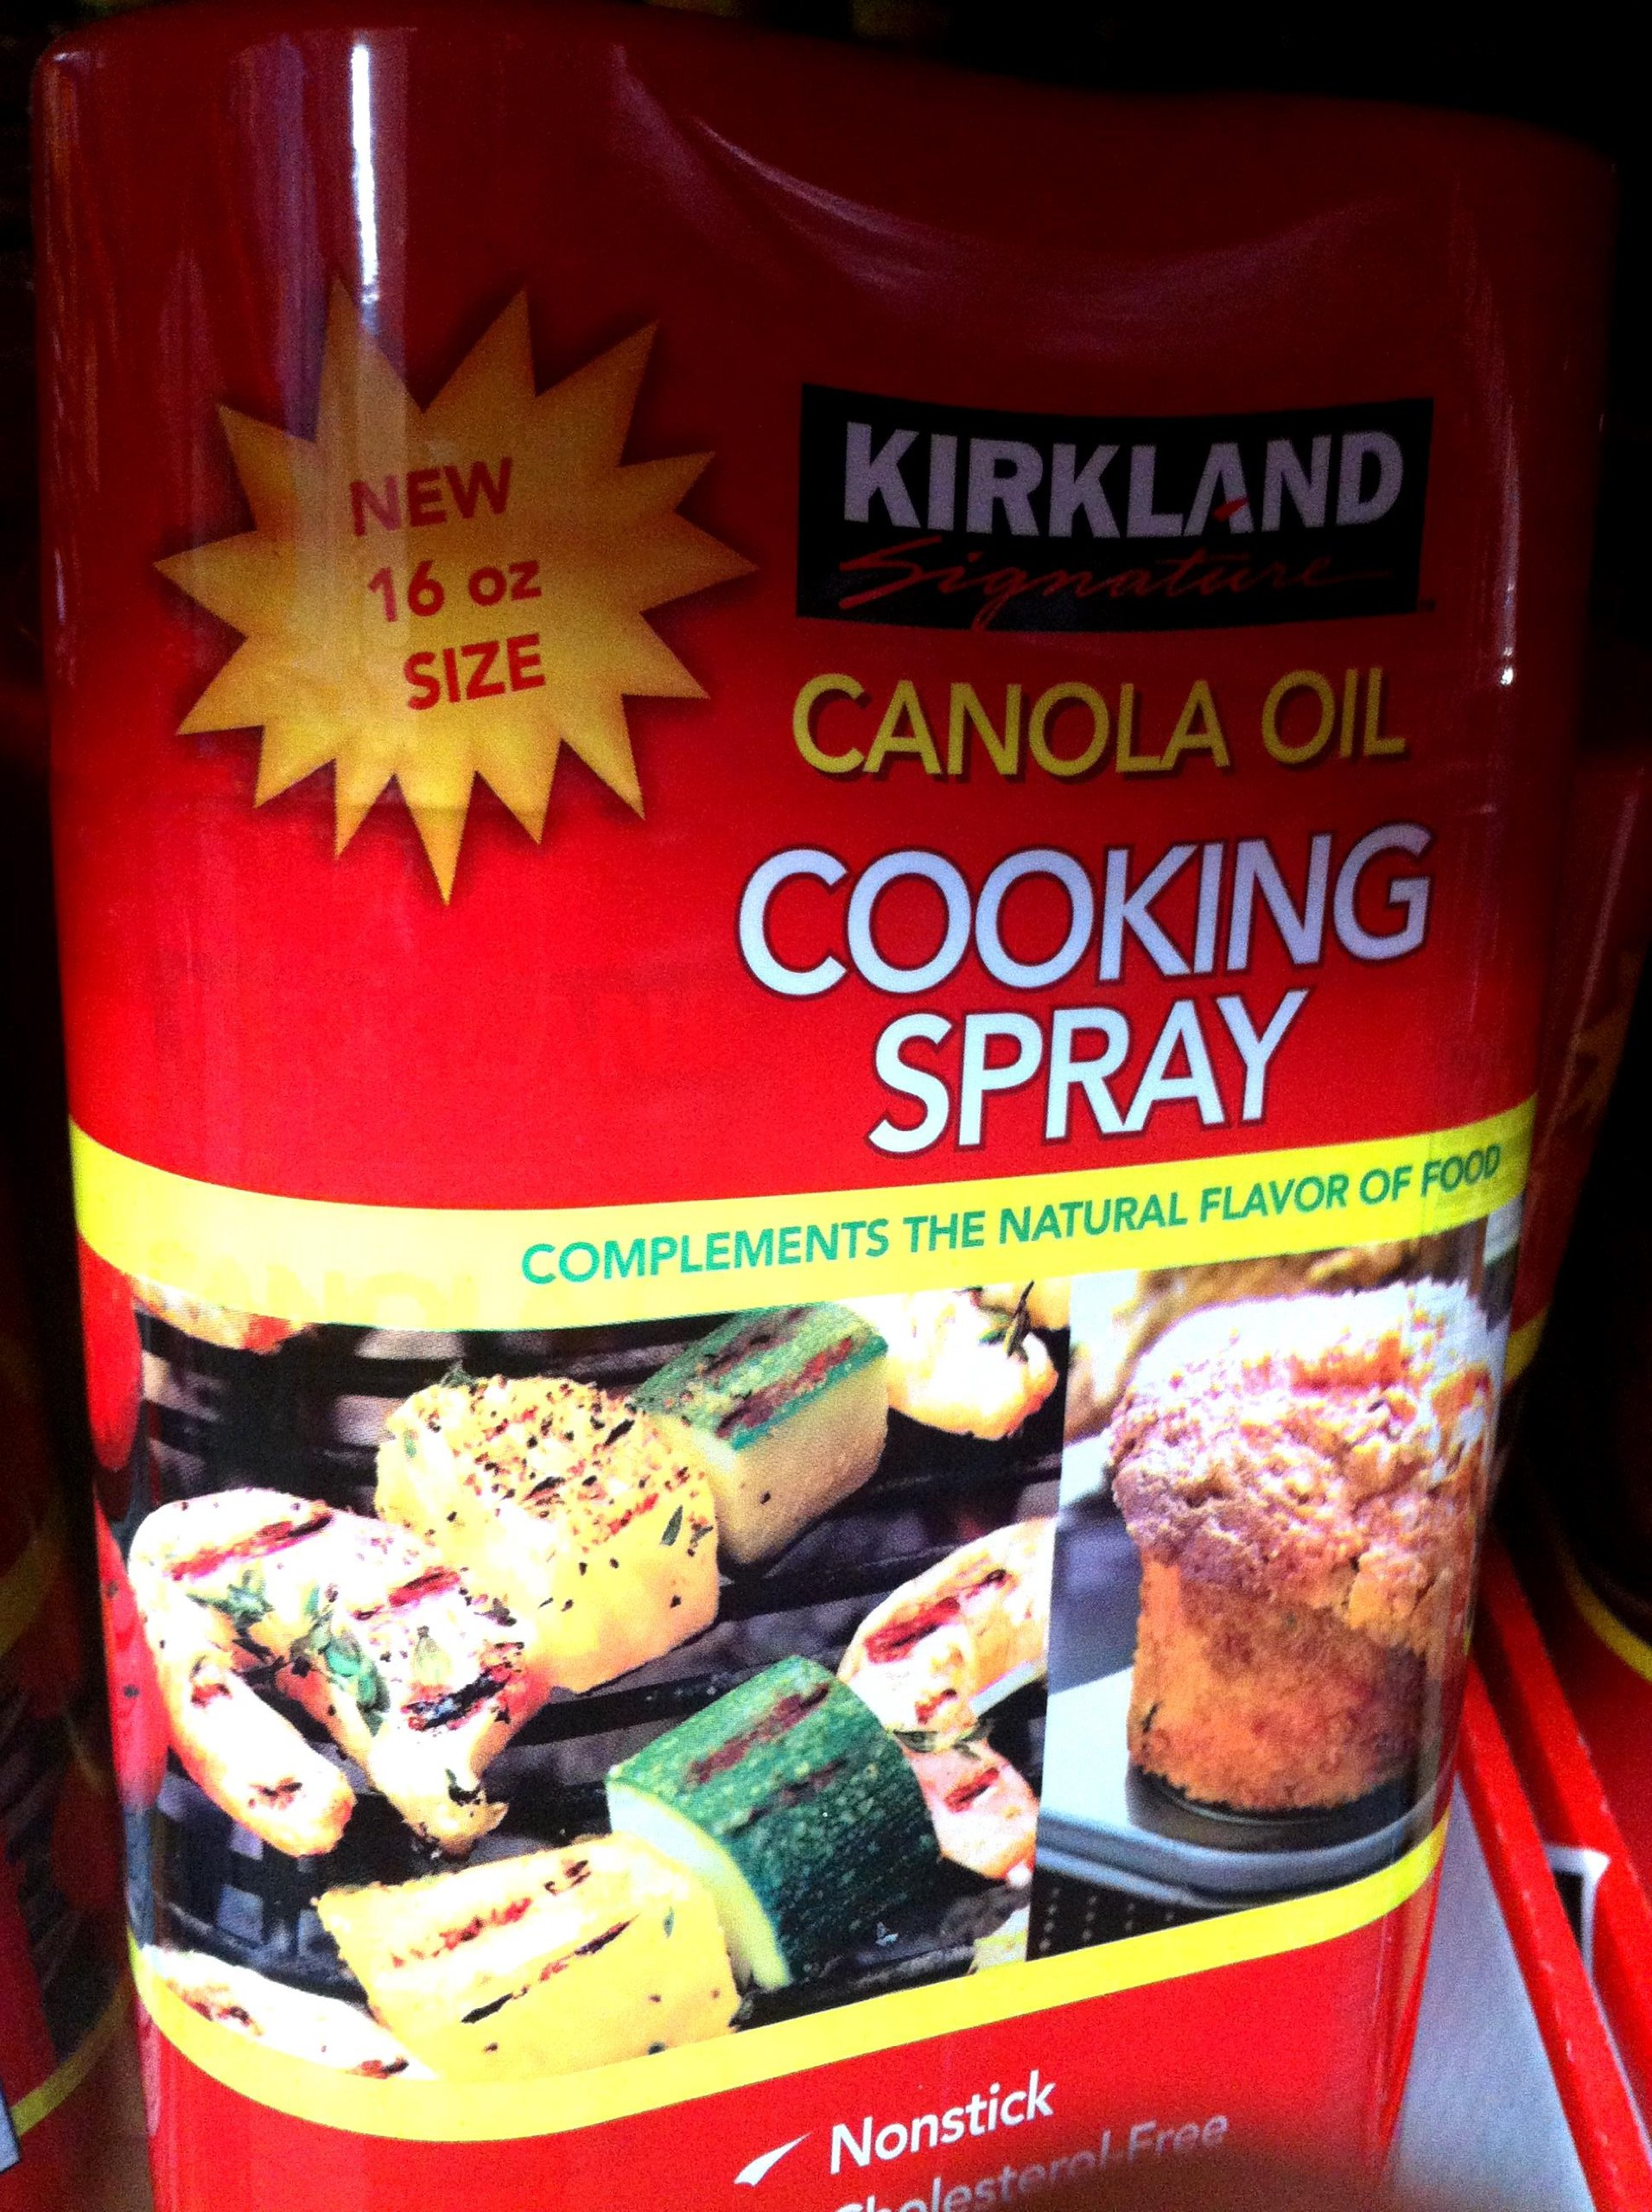 Kirkland Signature Canola Oil Cooking Spray 16 Oz - 2 Pack by Kirkland Signature (Image #1)